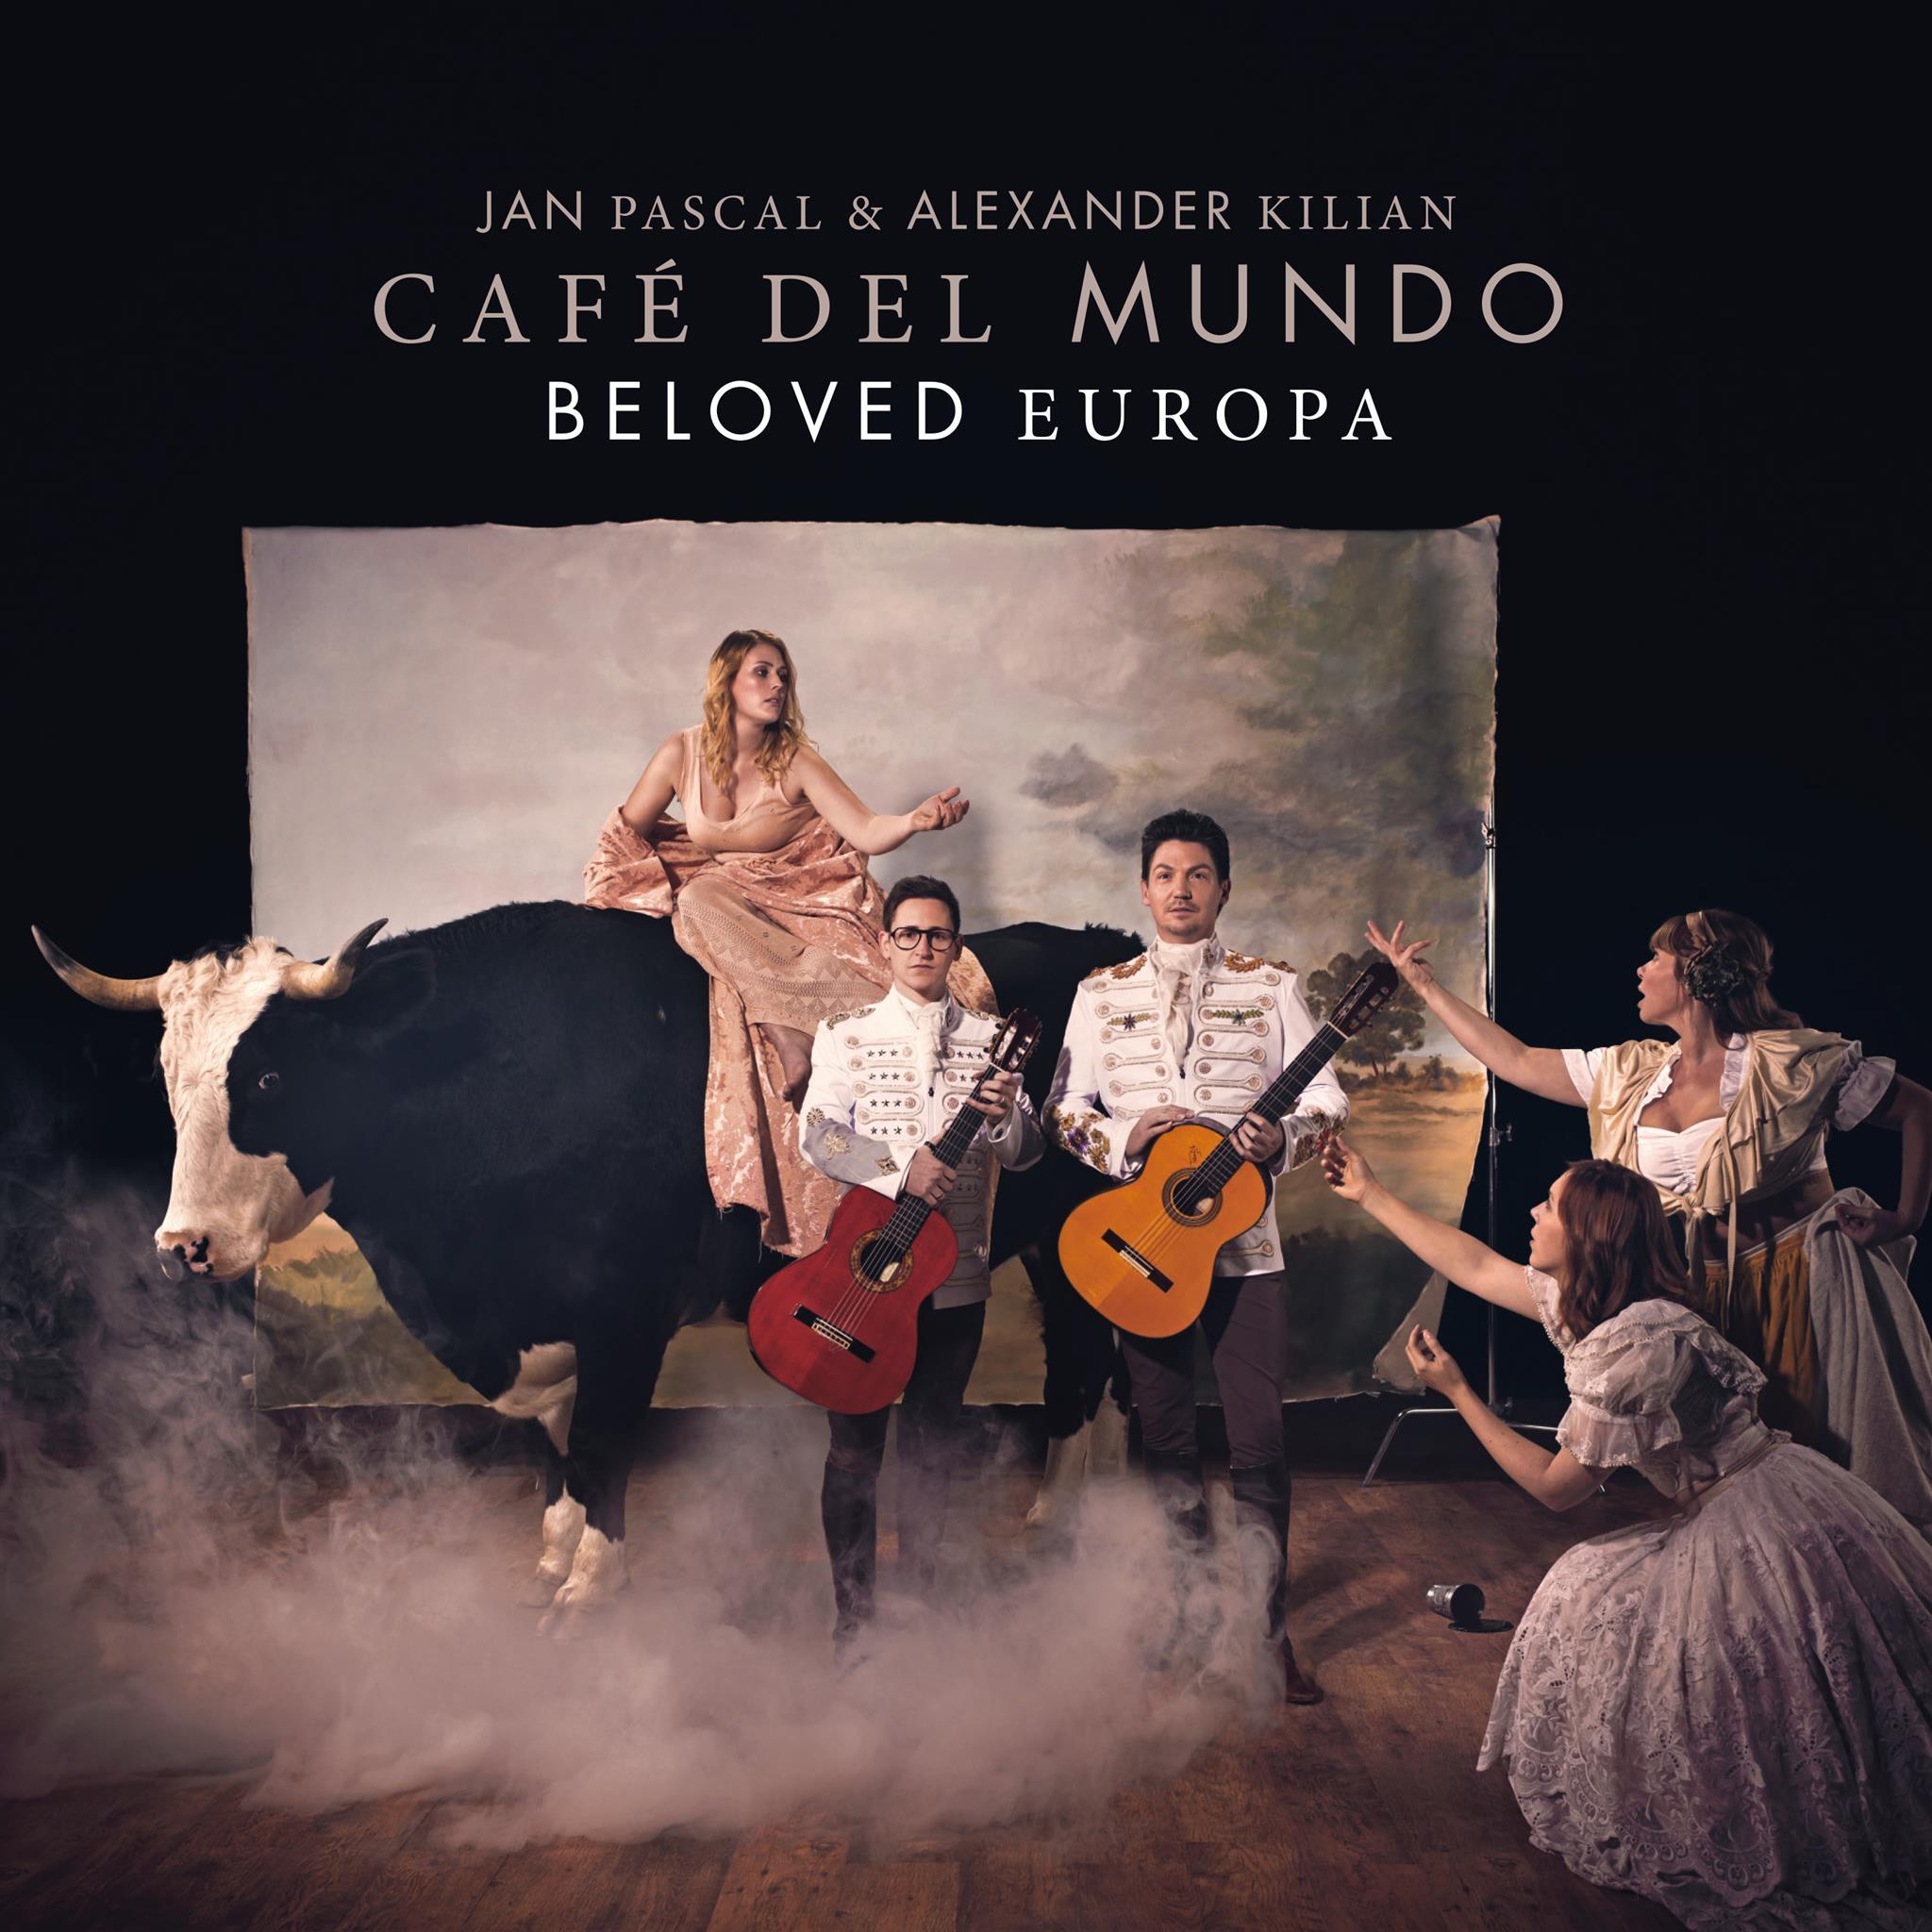 Café Del Mundo Beloved Europa Glm Music Gmbh